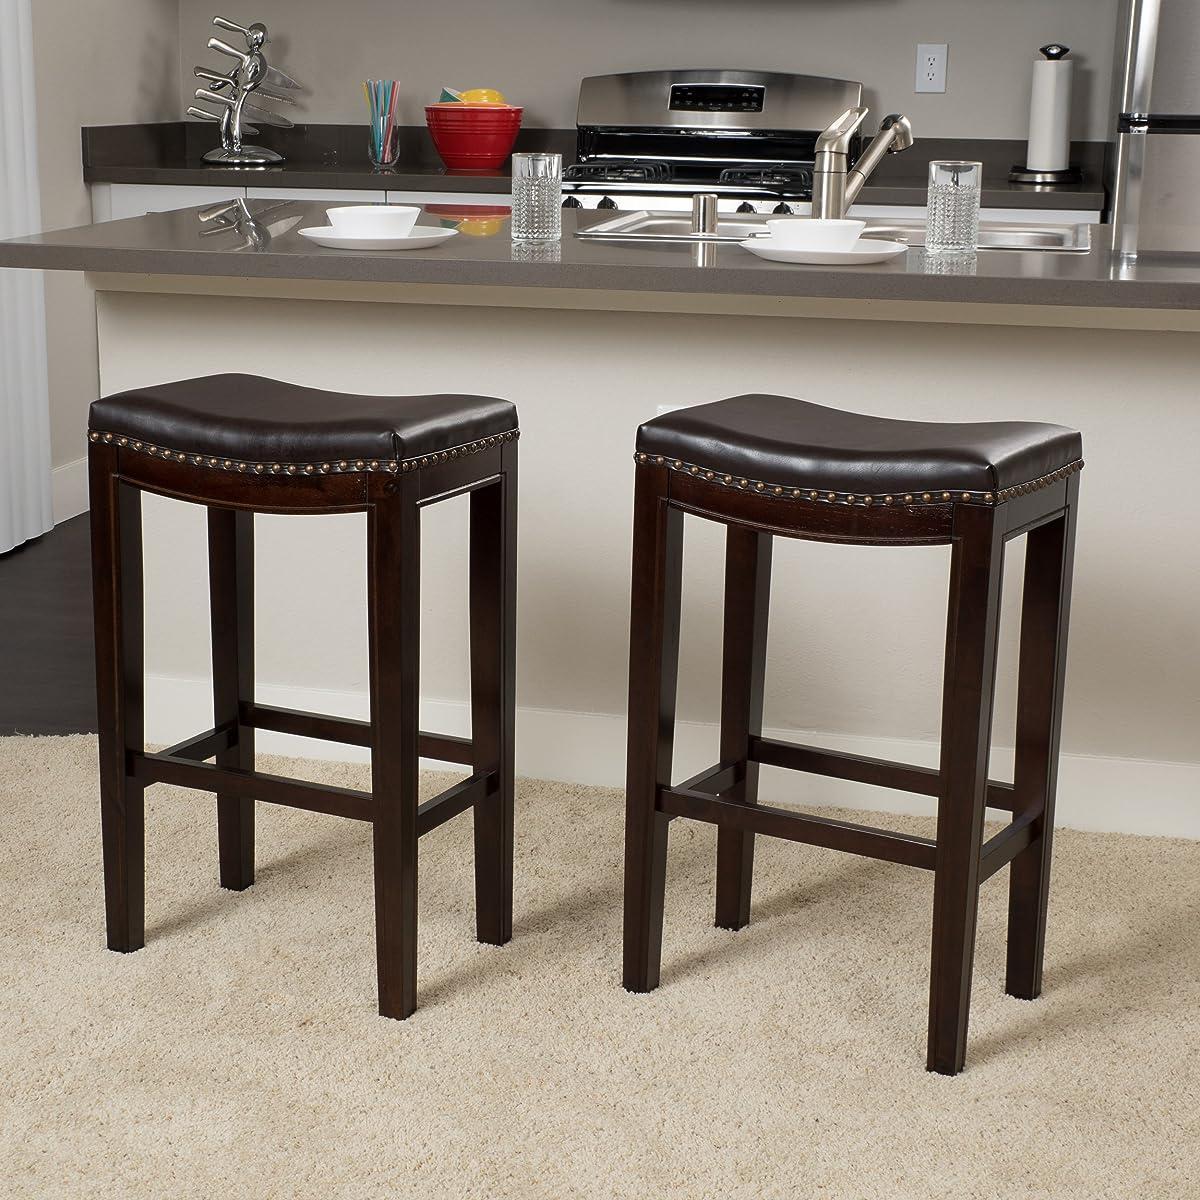 Jaeden Backless Brown Leather 30 high Bar Stools (Set of 2)